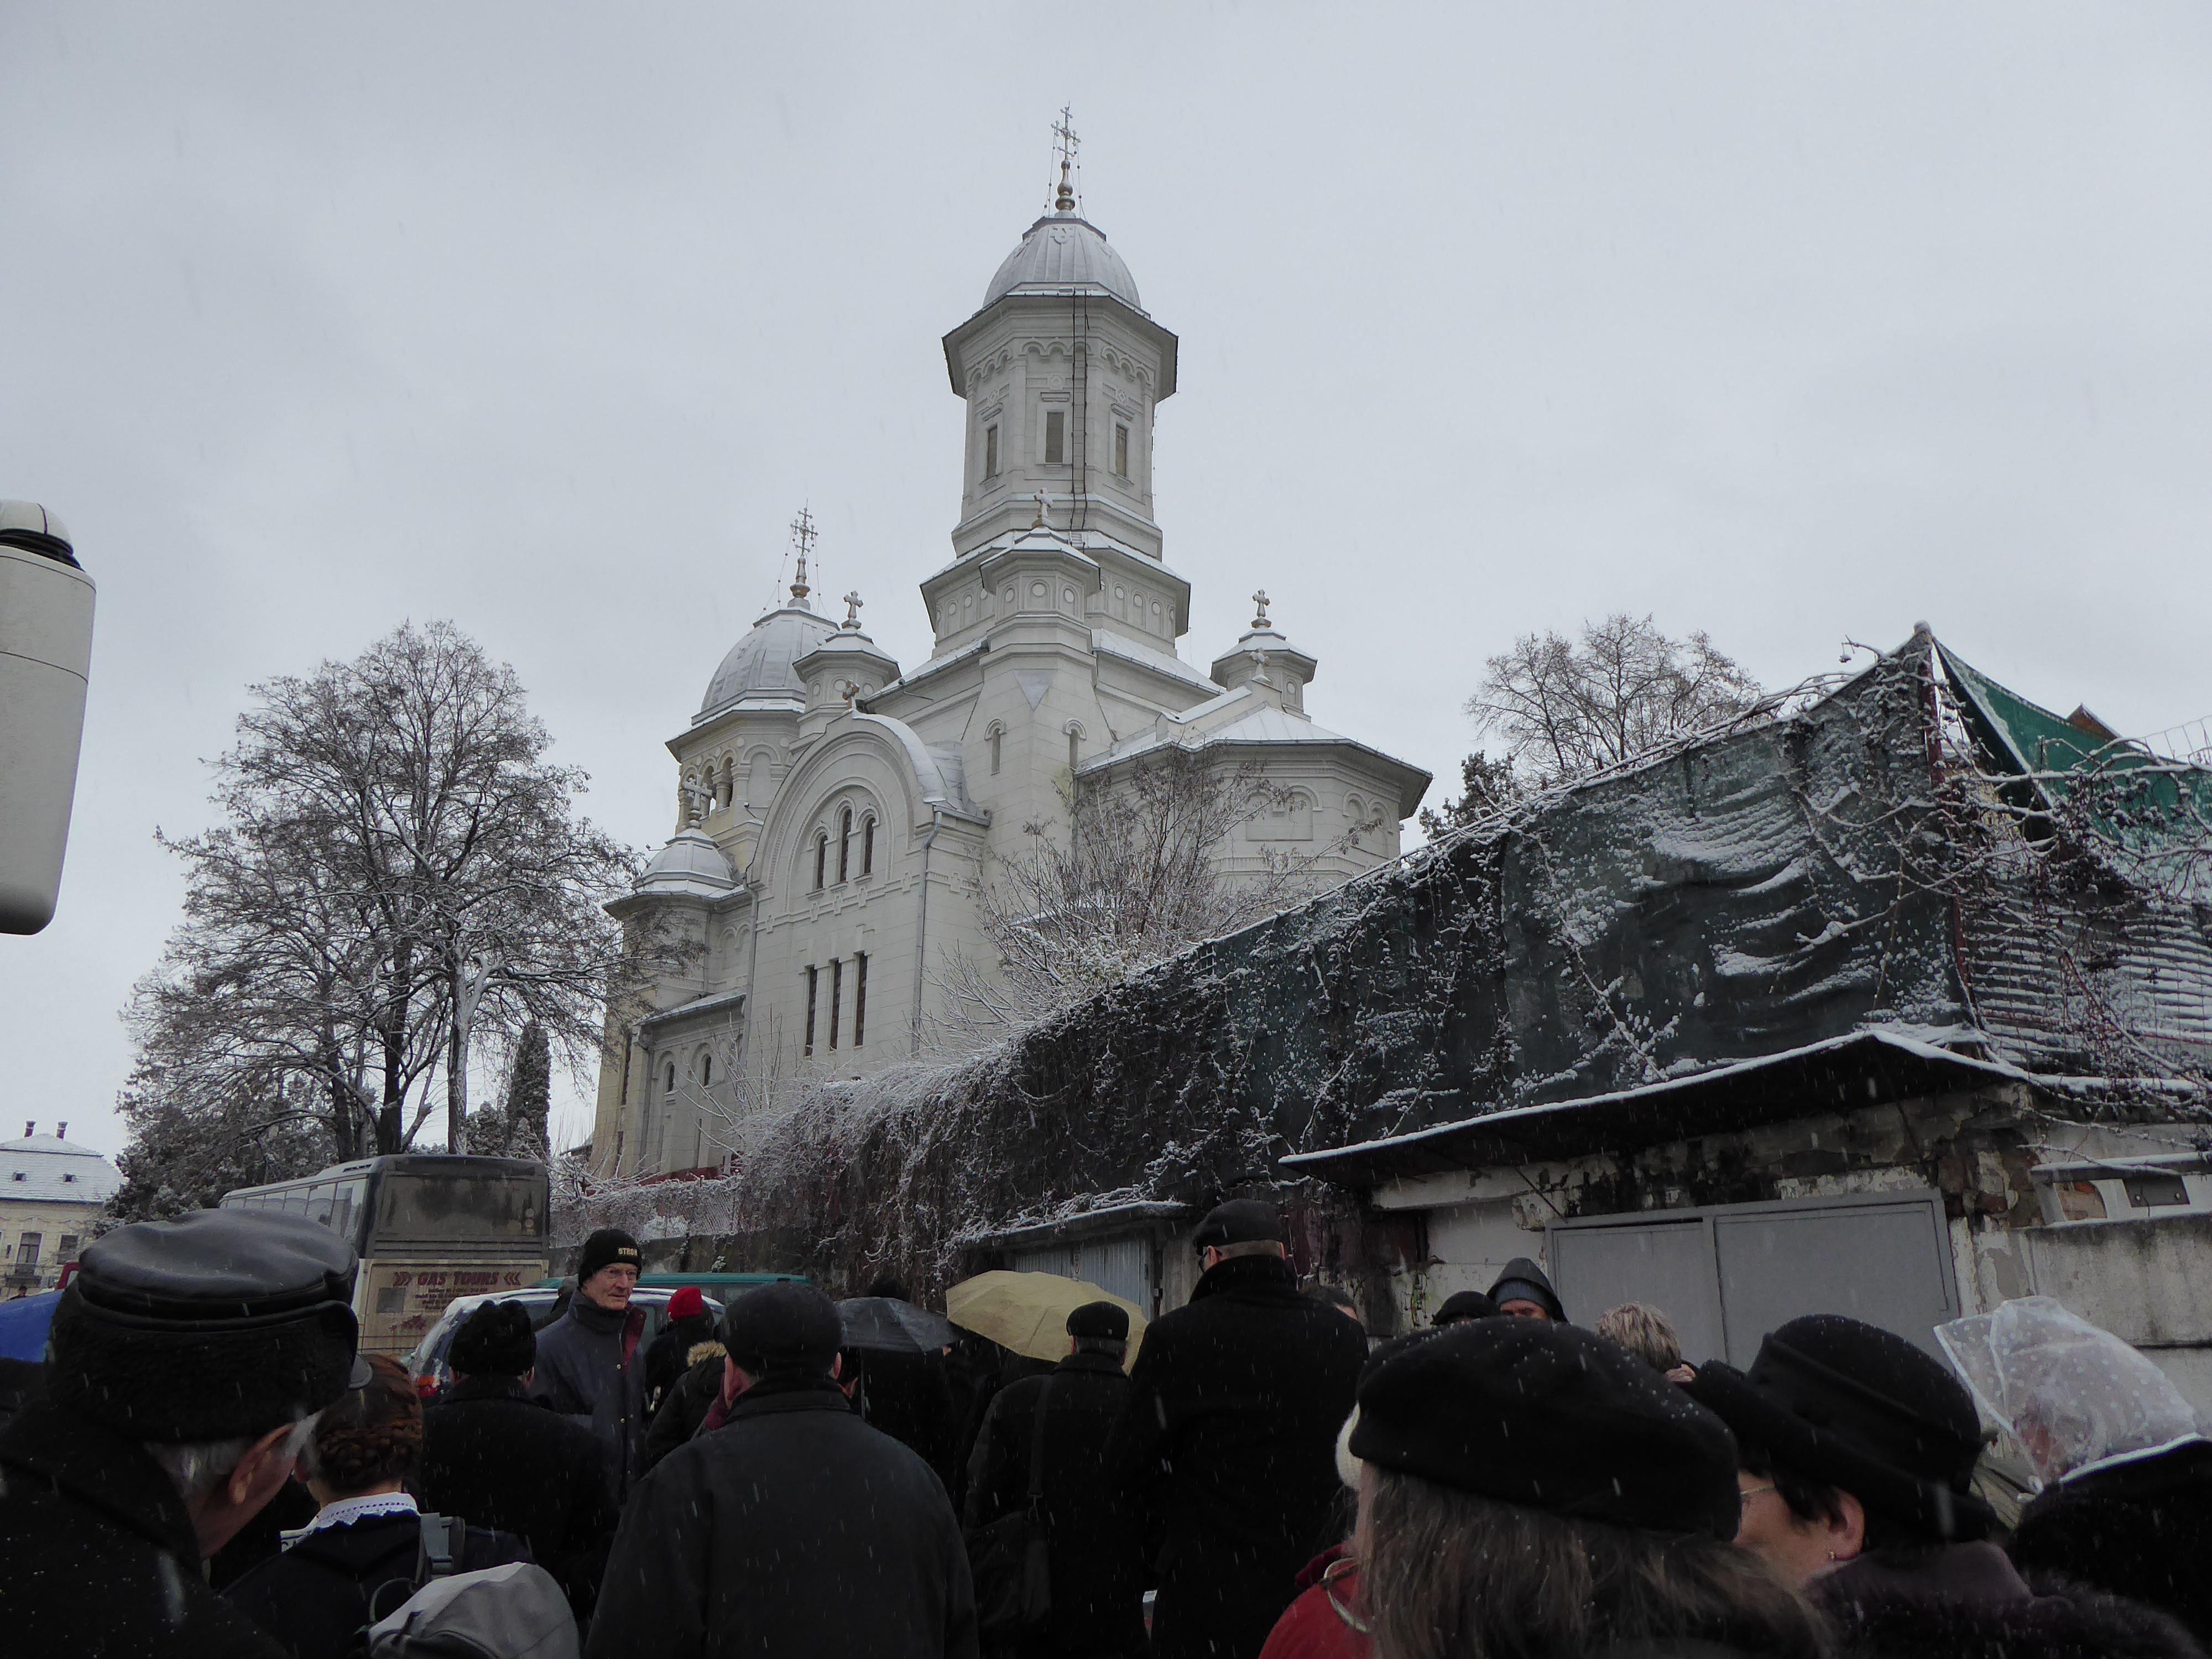 Assembing in Torda near the Orthodox Church